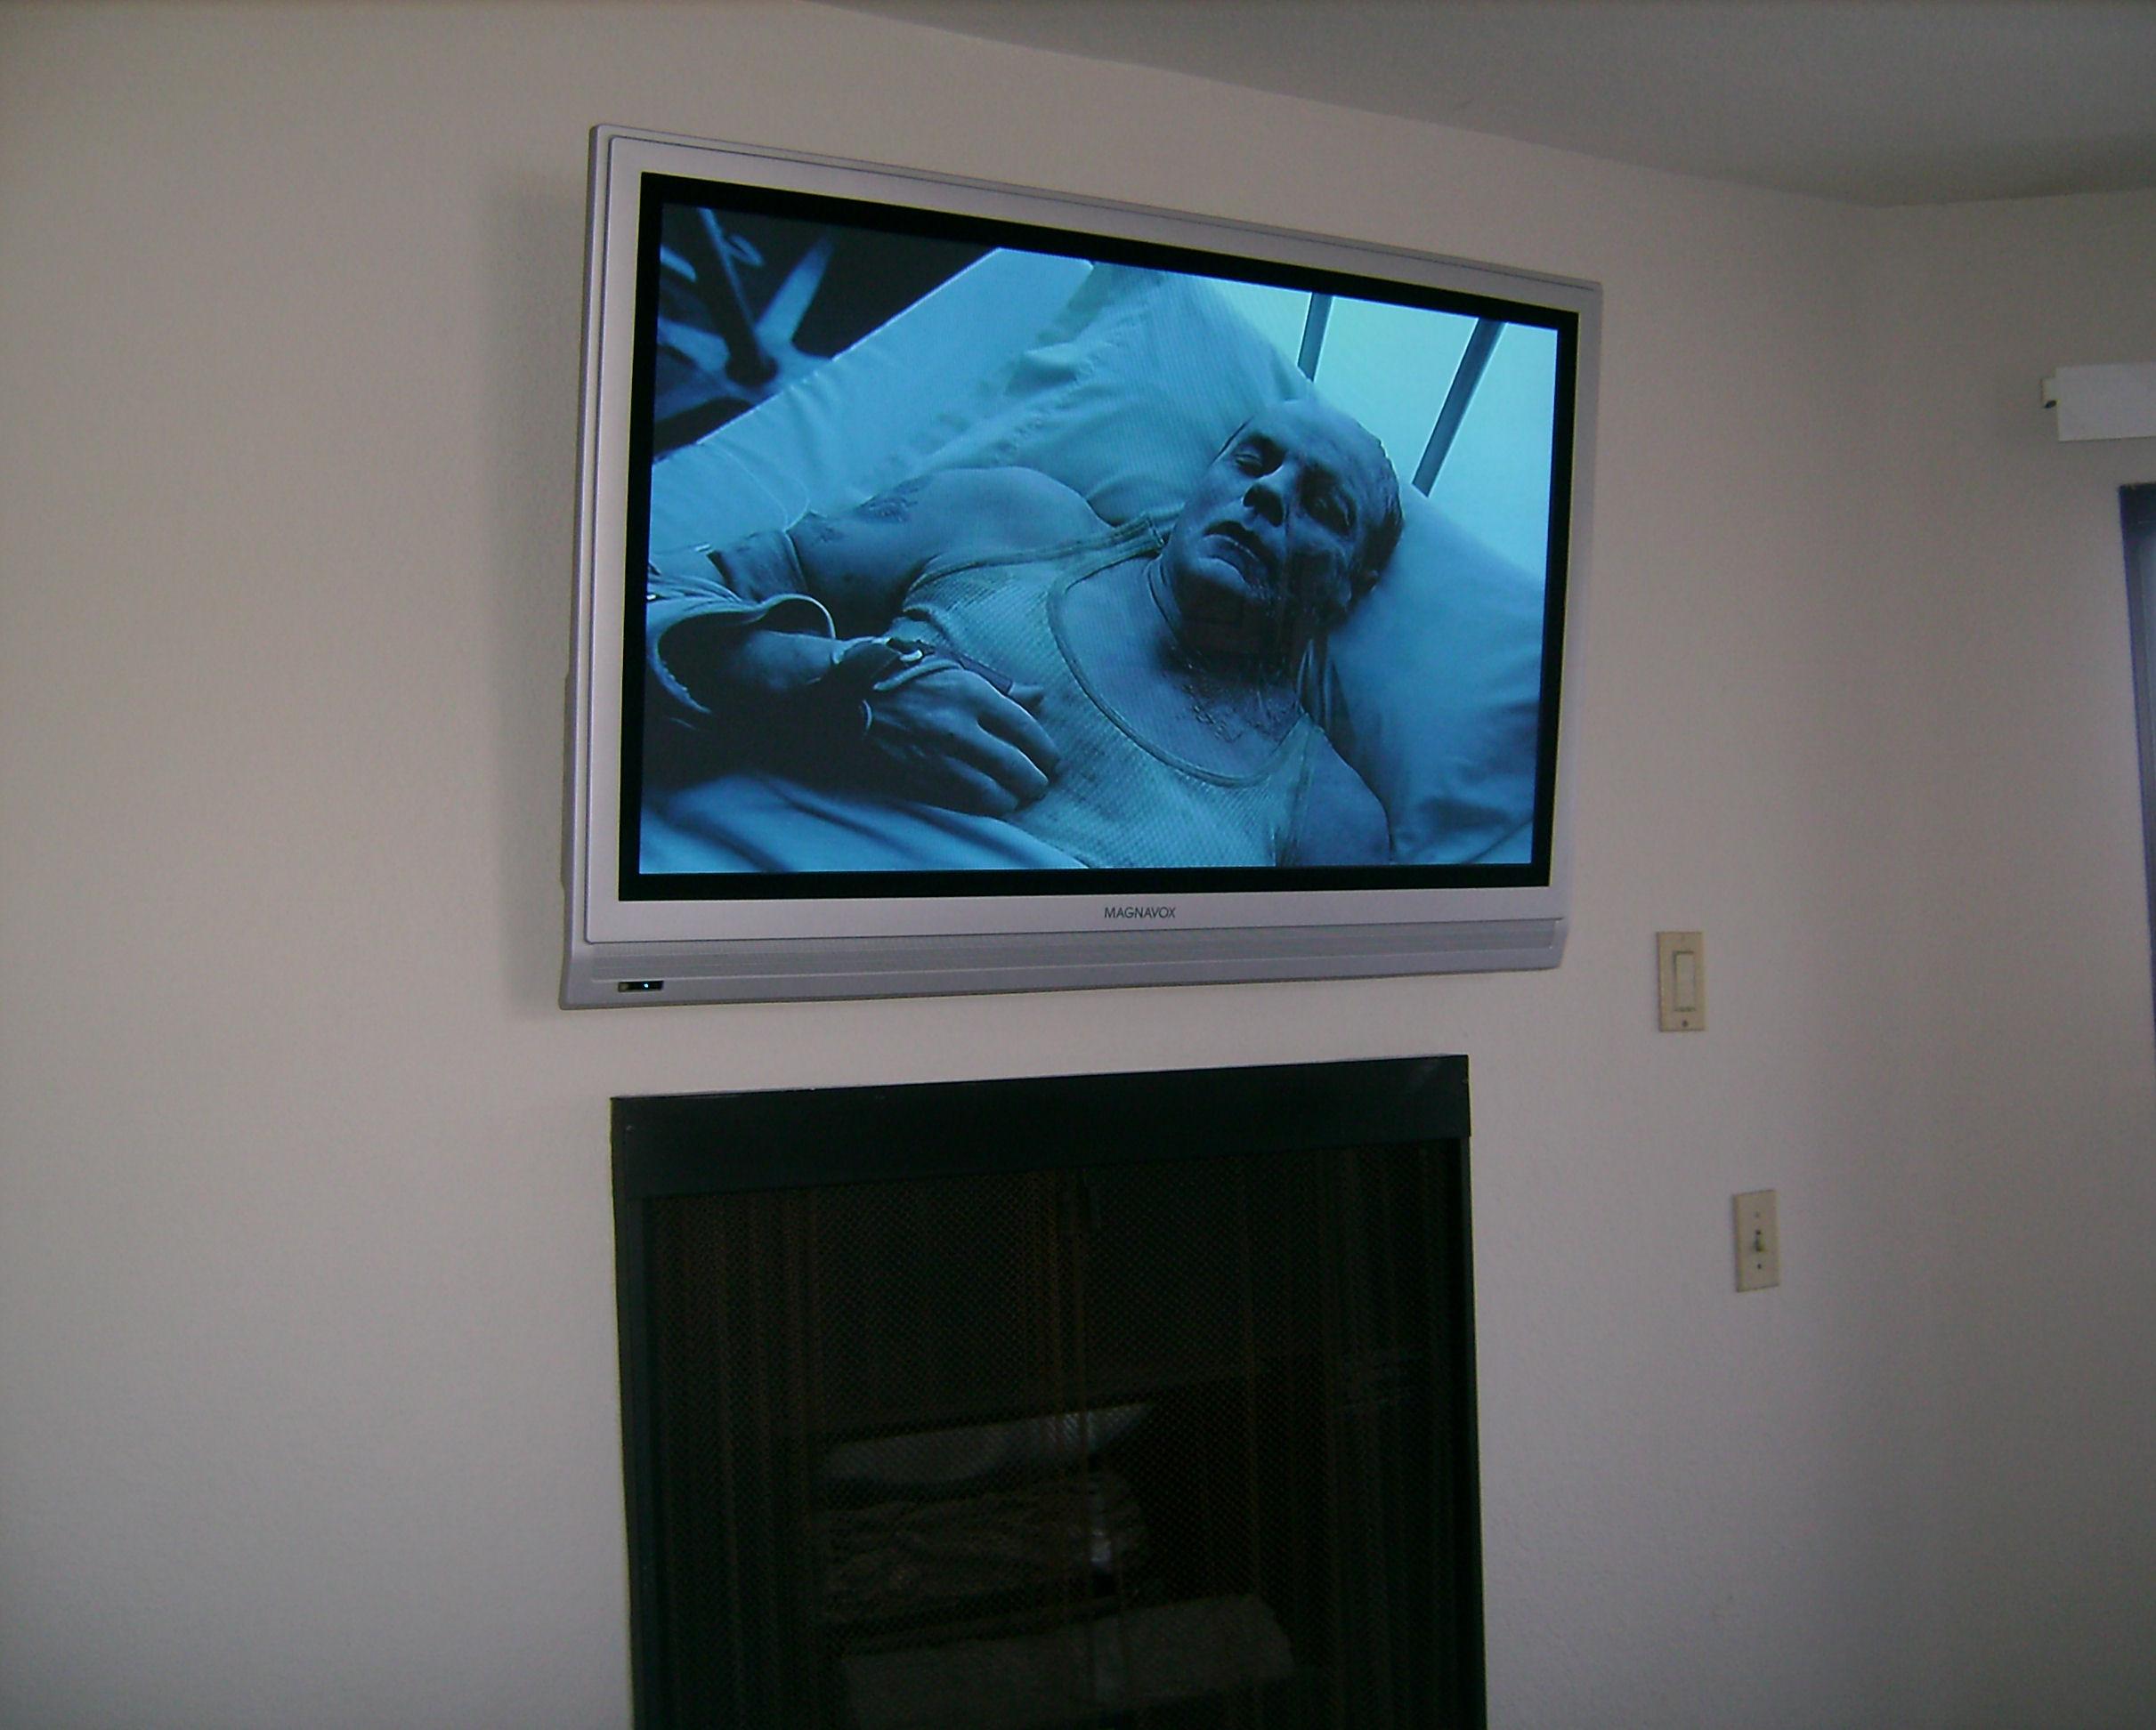 Premium Magnavox TV Fireplace Installation